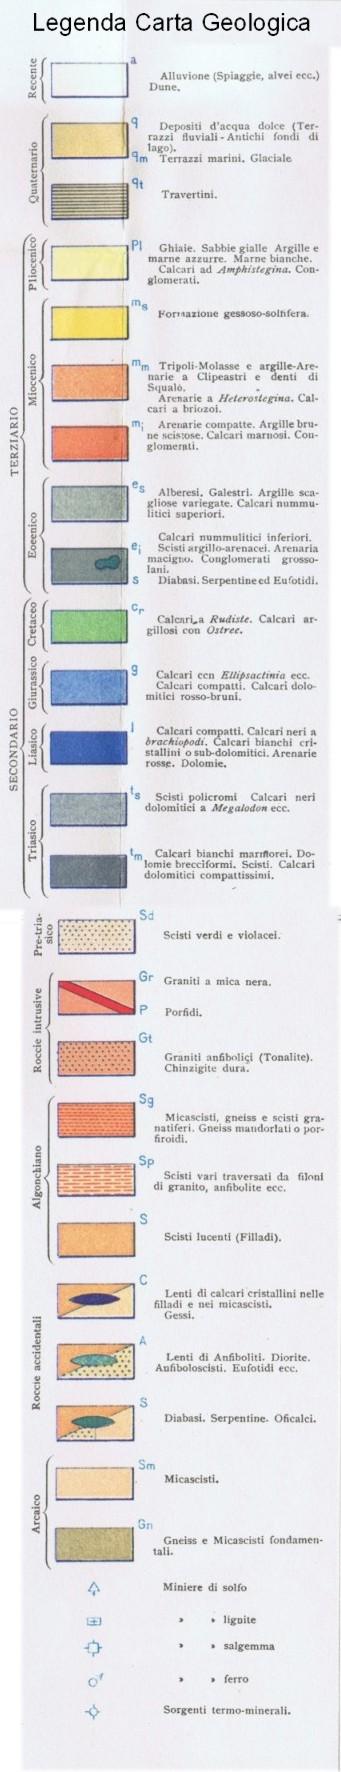 Carta Geologica Cortese 1934: www.luniversoeluomo.org/geolog/calabr/cortese/1-leg.htm